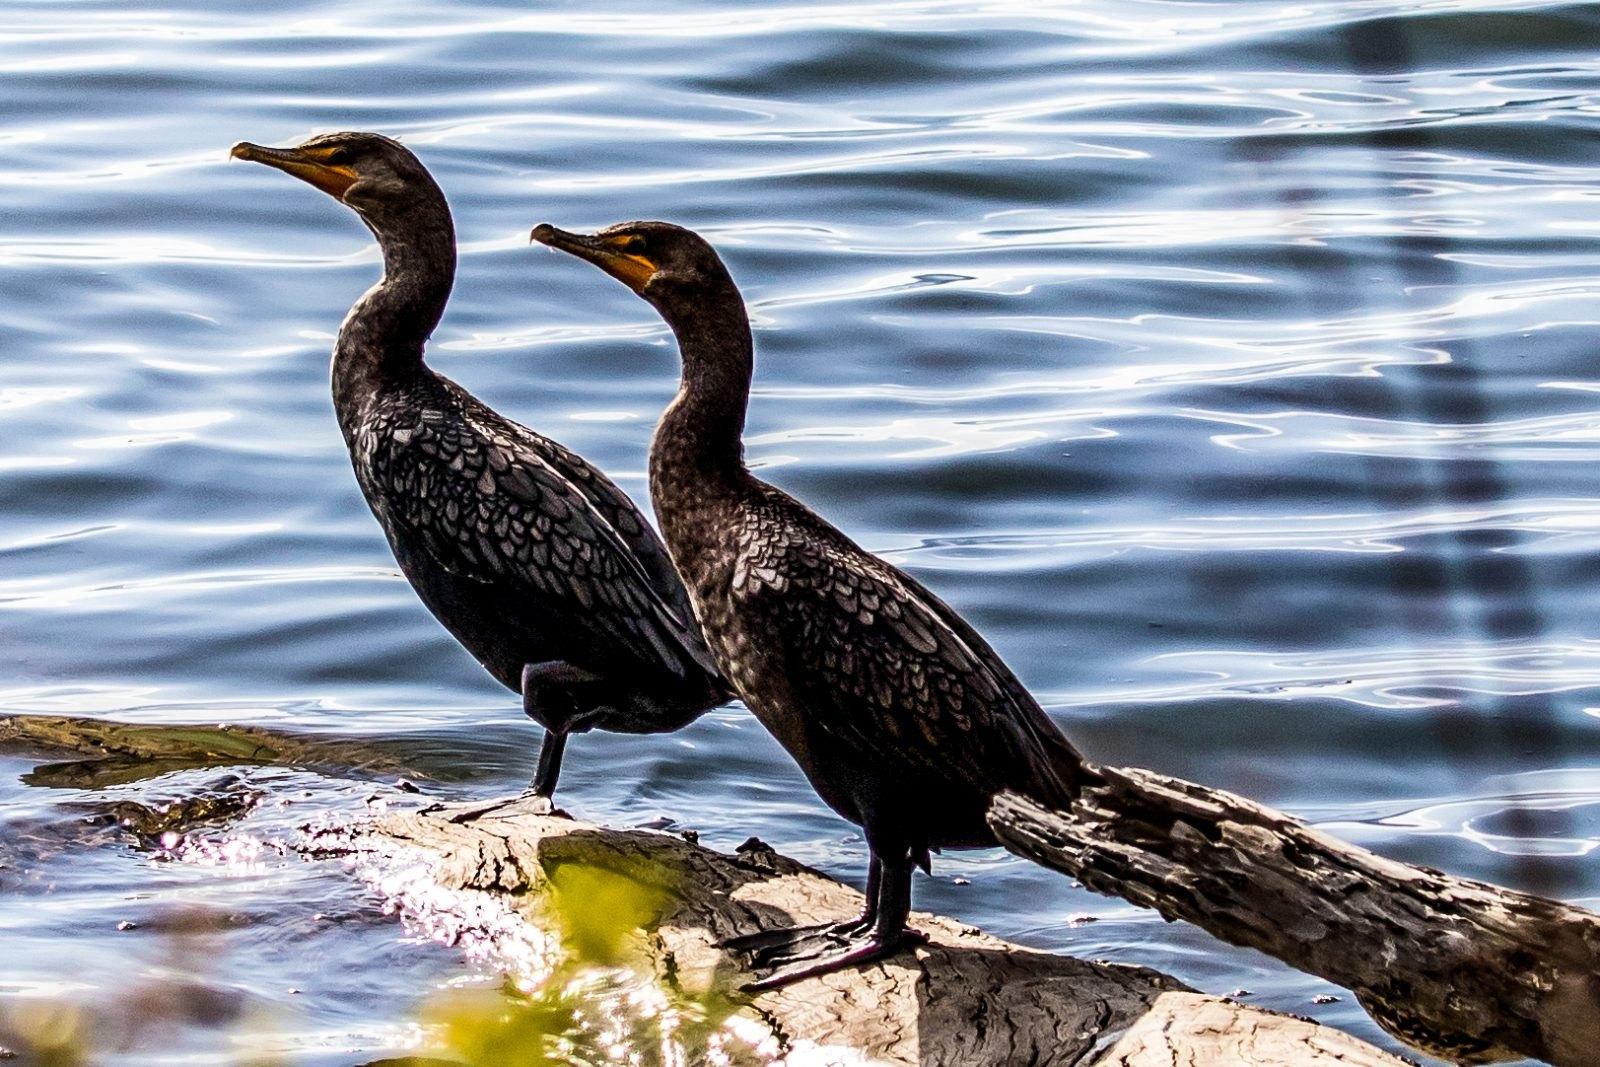 Double-crested Cormorants by Glenn Bush